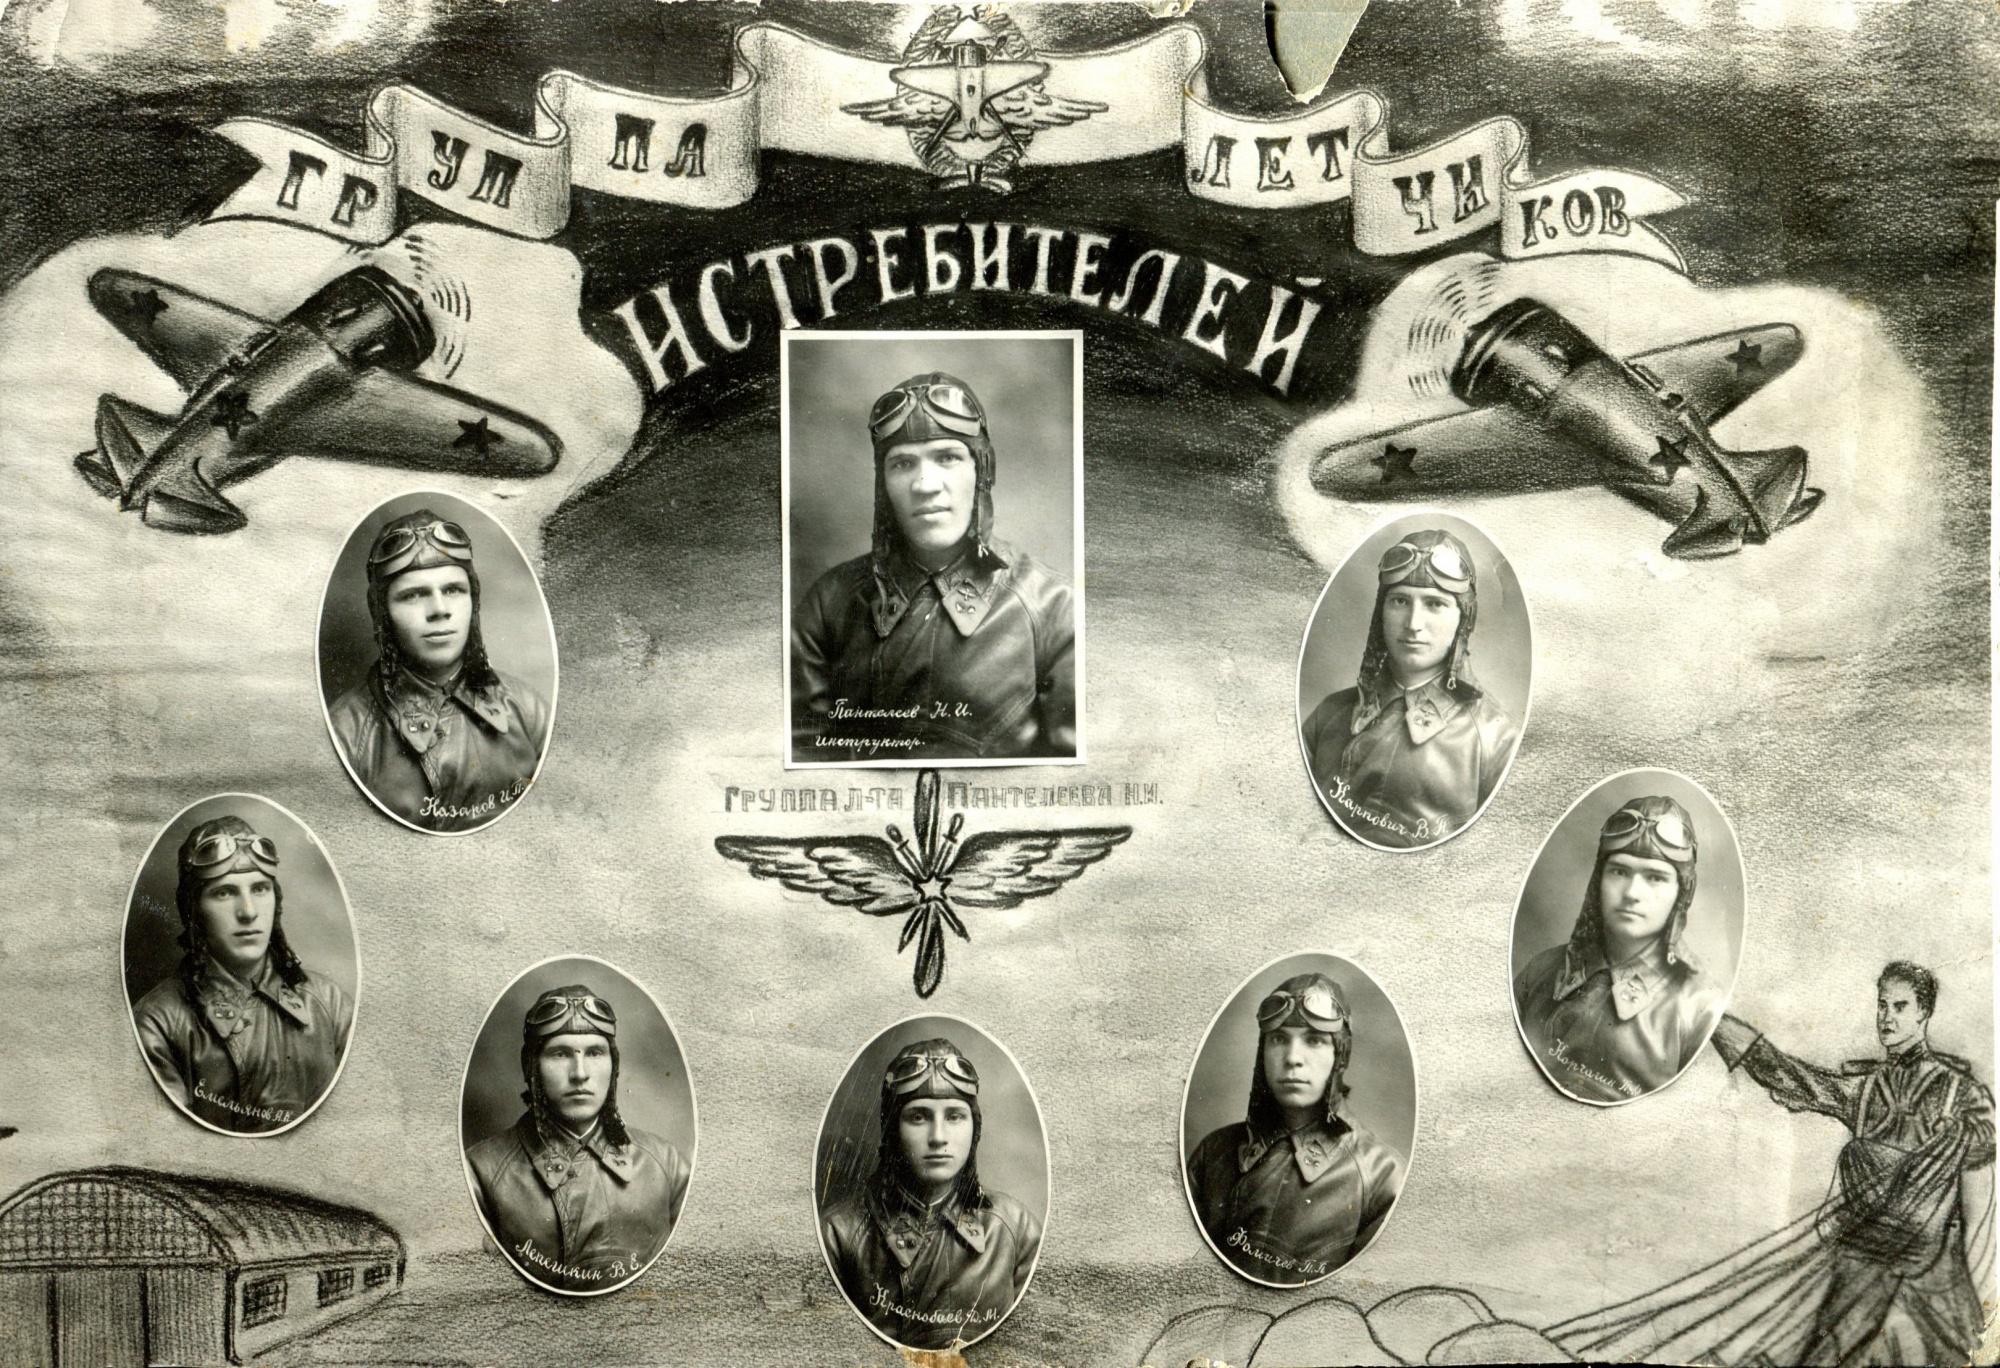 1938. Группа инструктора Пантелеева Н.И.